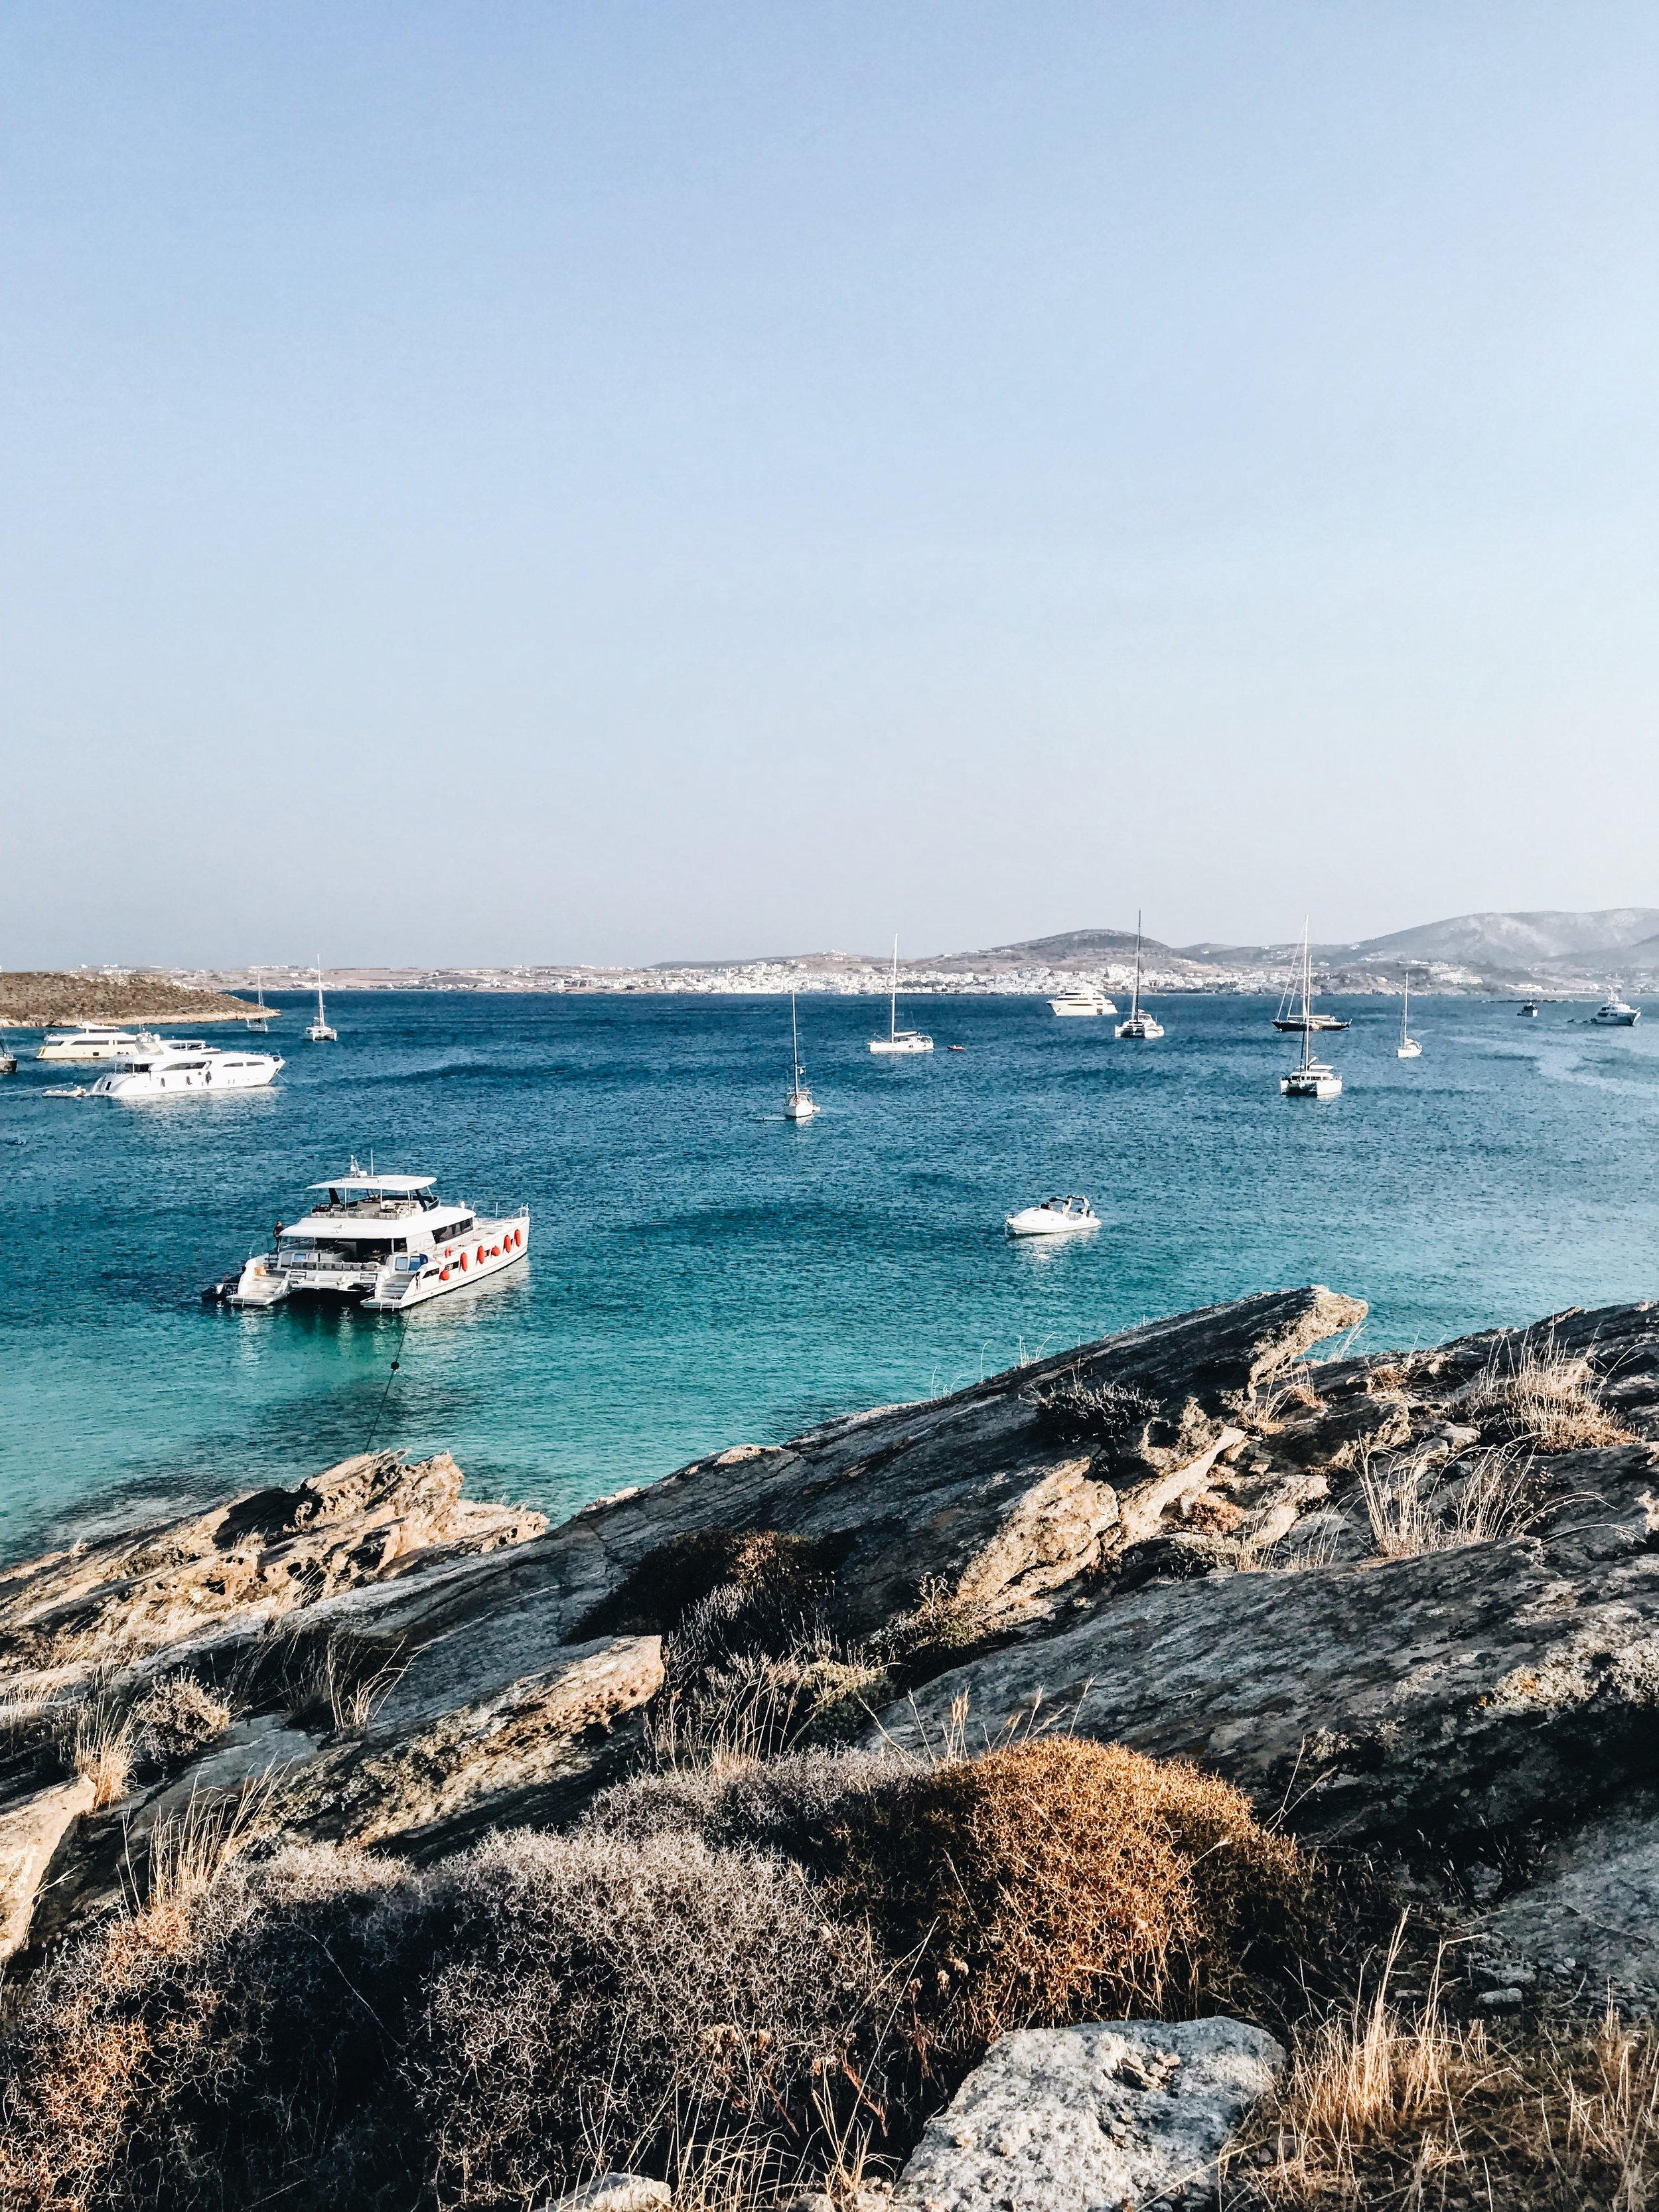 The secluded beach a few minutes walk from Monastiri beach on Paros